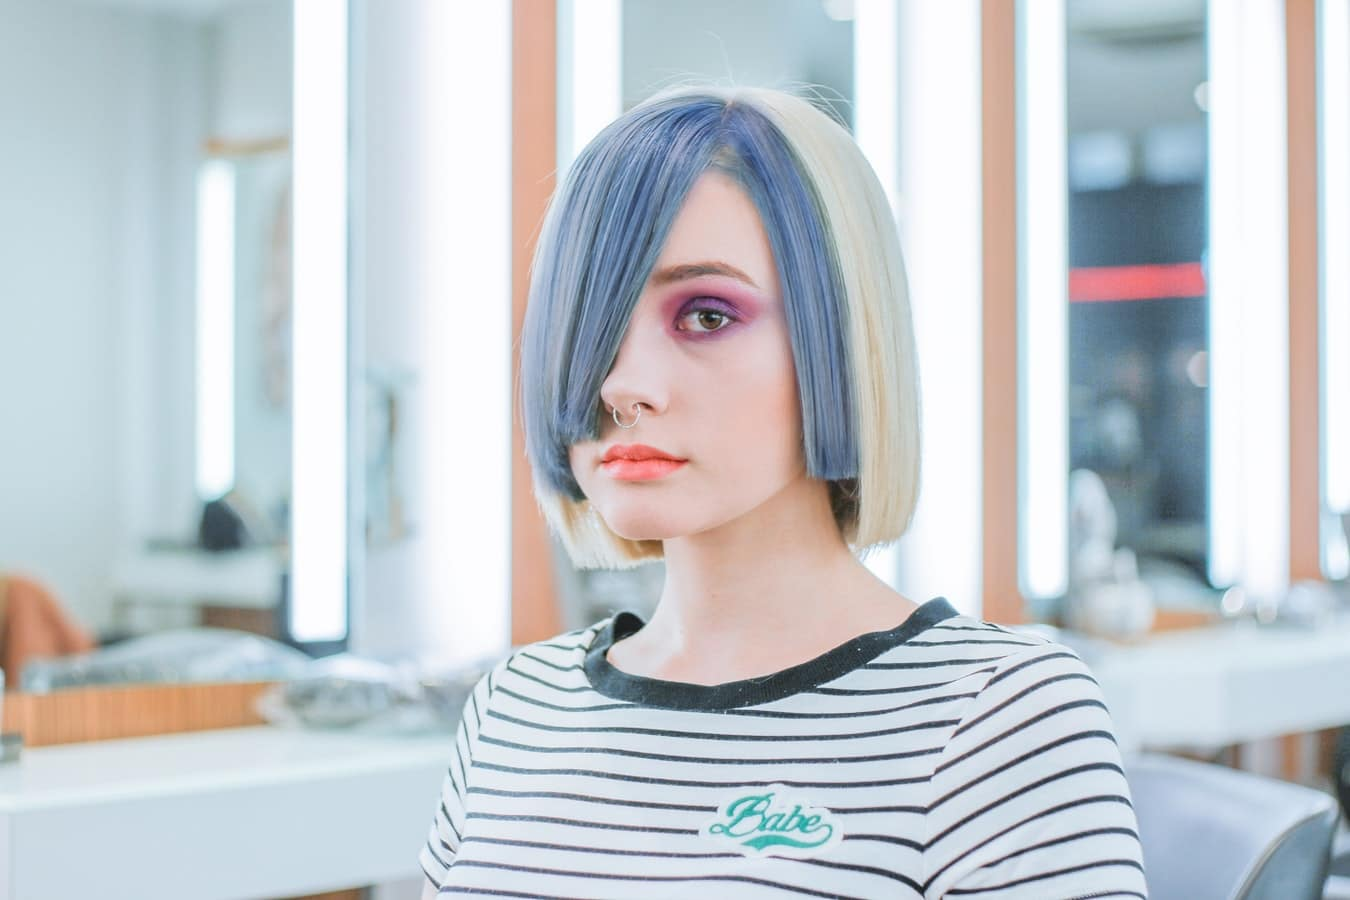 how long does it take to dye hair at salon